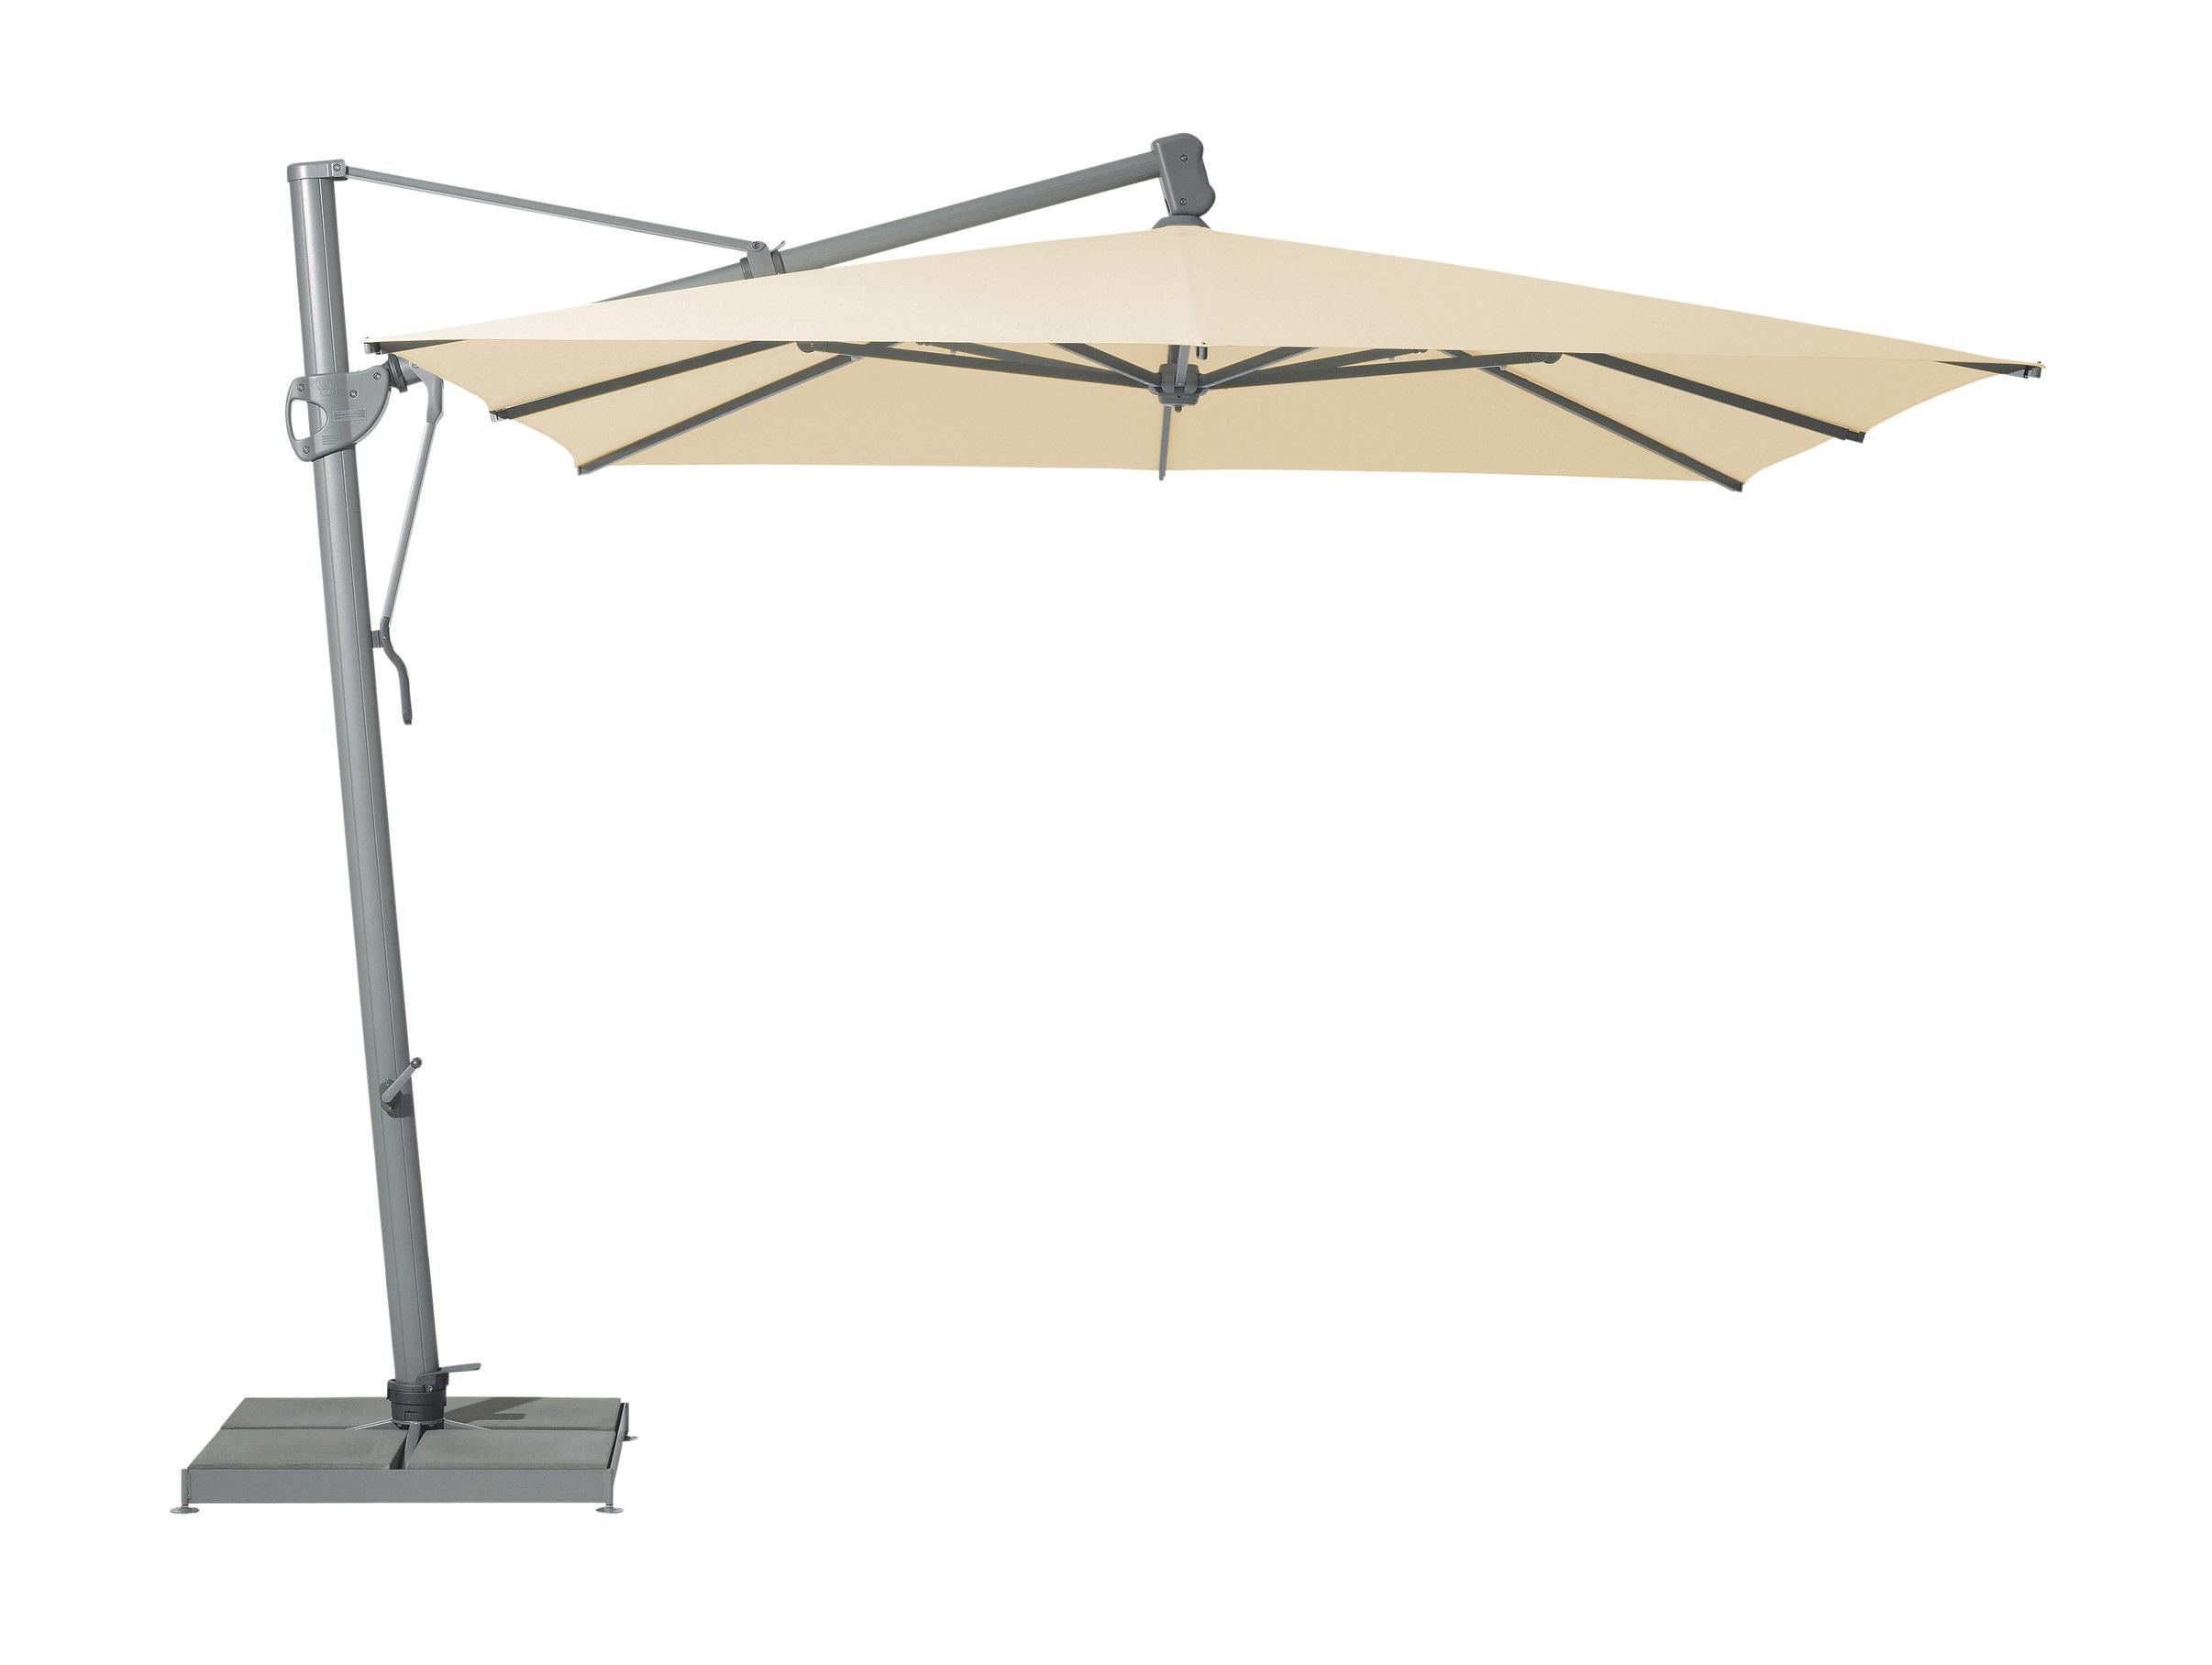 Уличный зонт sombrano easy (glatz) бежевый 350.0x300x350.0 см.